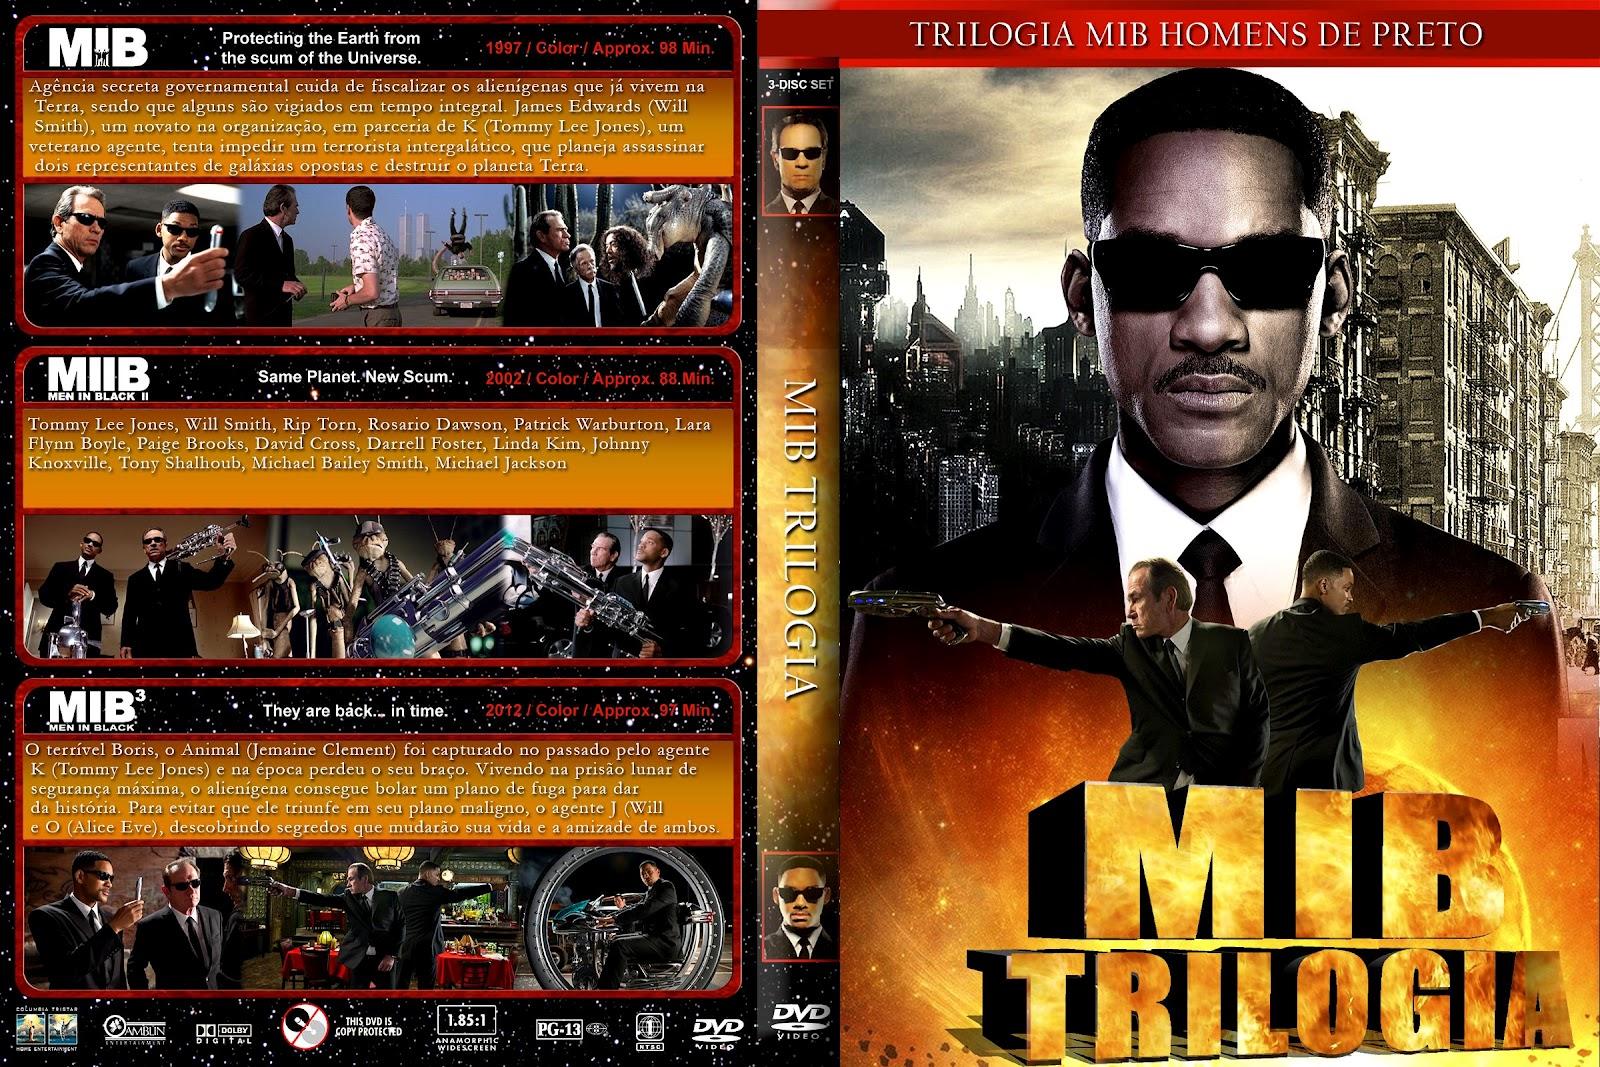 Trilogia MIB Homens de Preto DVDRip XviD Dual Áudio Trilogia Mib